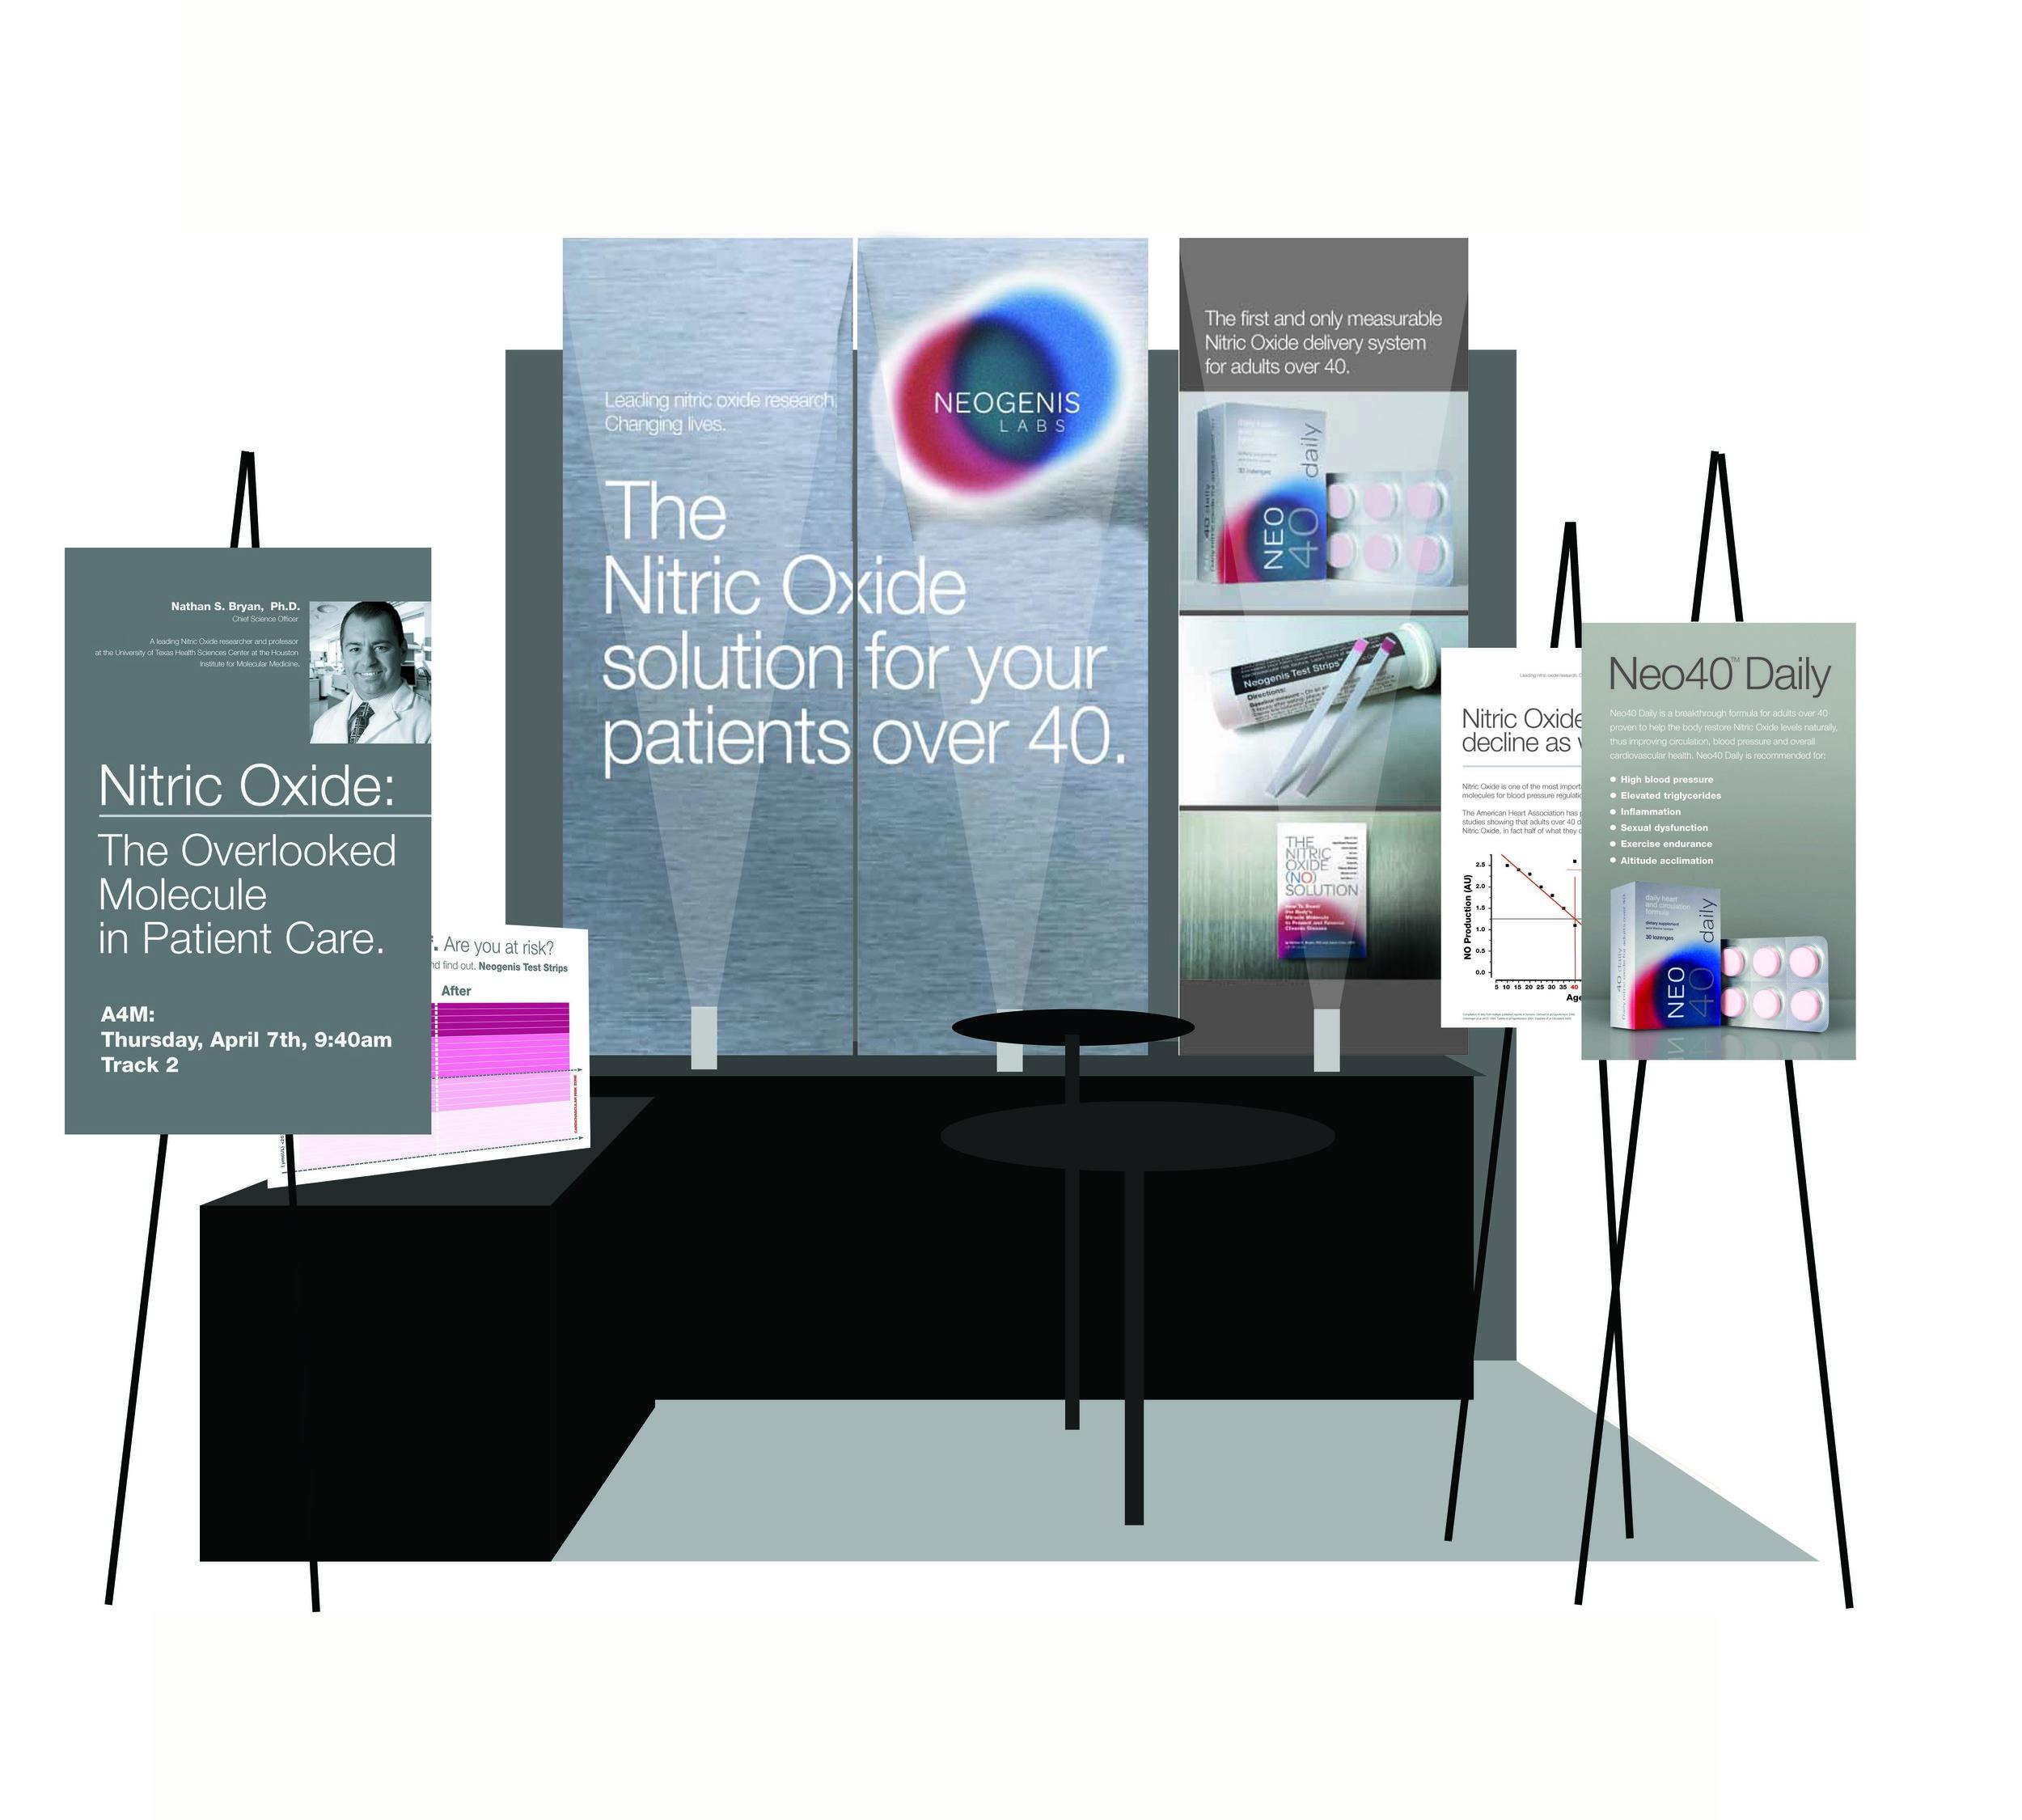 Neo_tradeshow booth layout.jpg